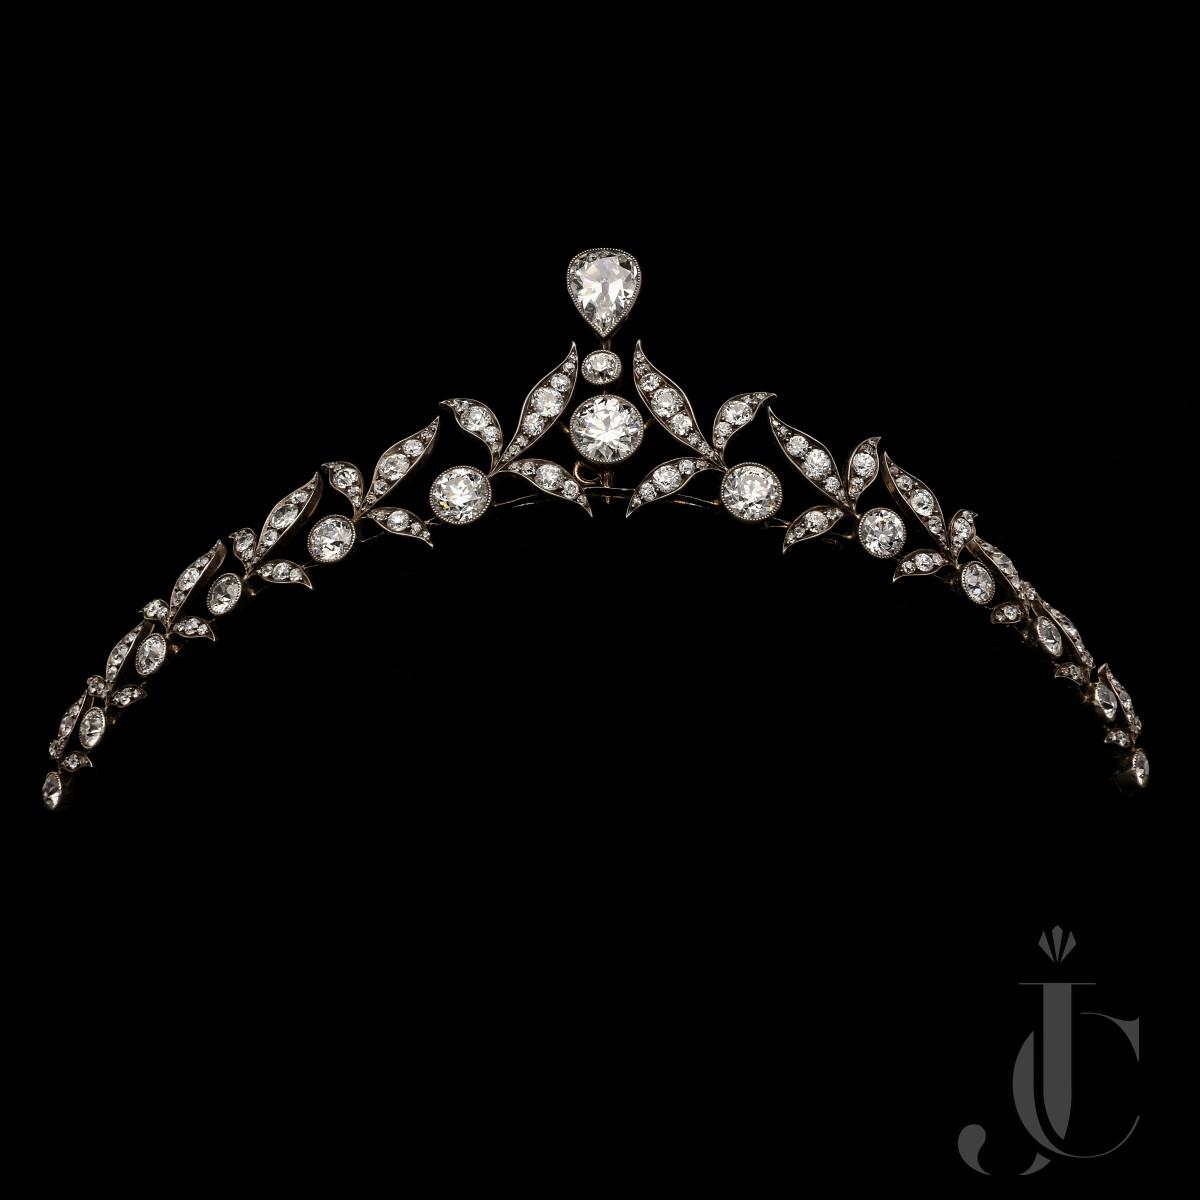 Victorian Diamond Leaf Tiara by Hancocks c.1900